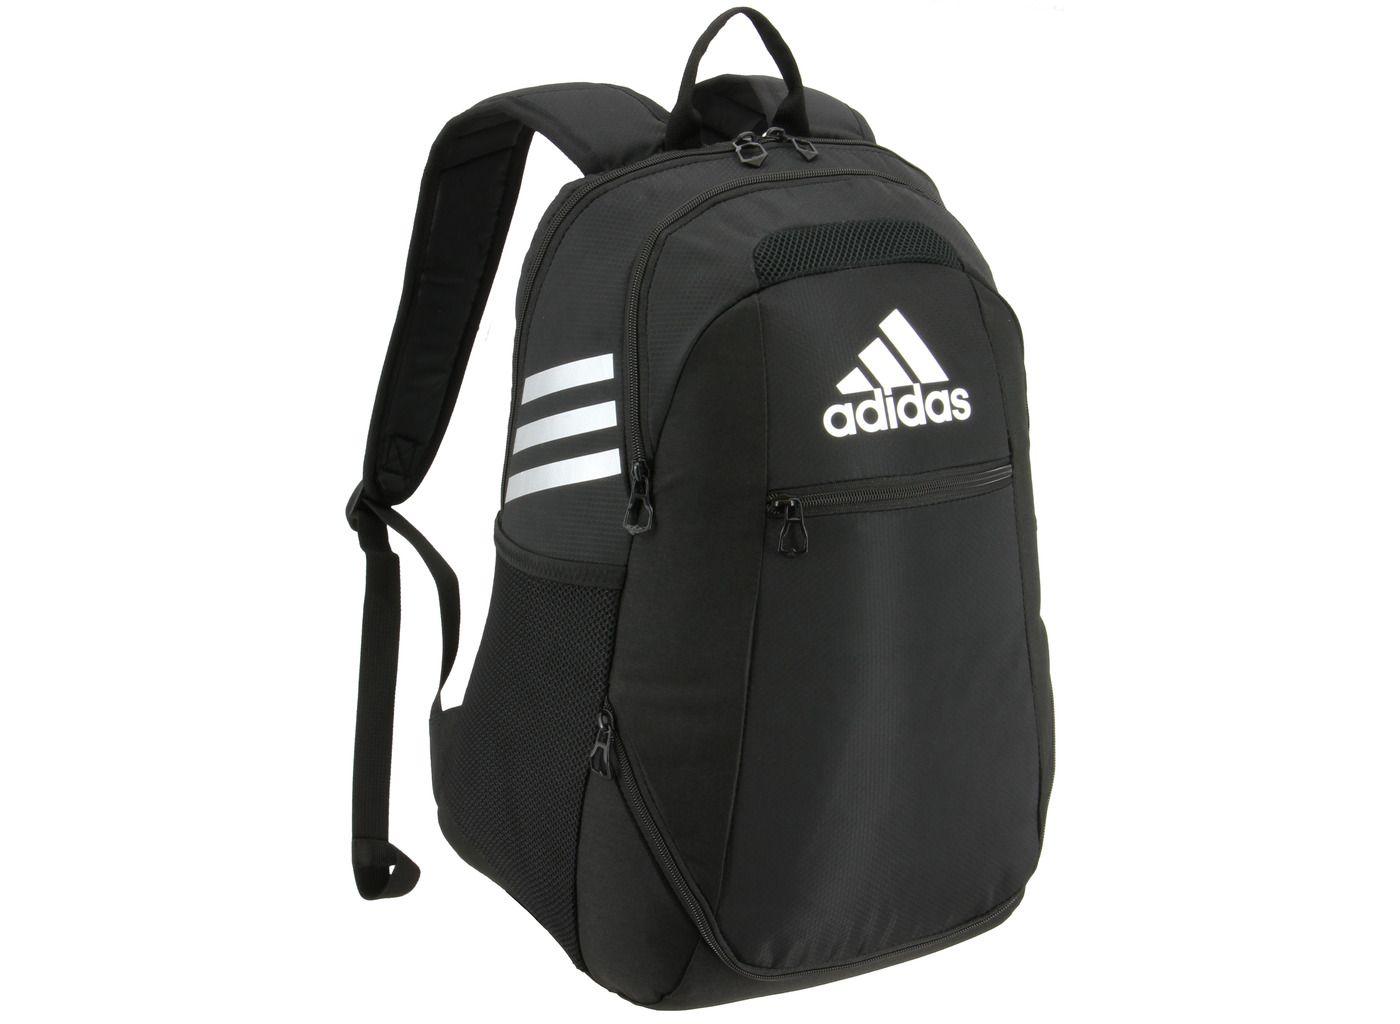 adidas Team Mundial Backpack